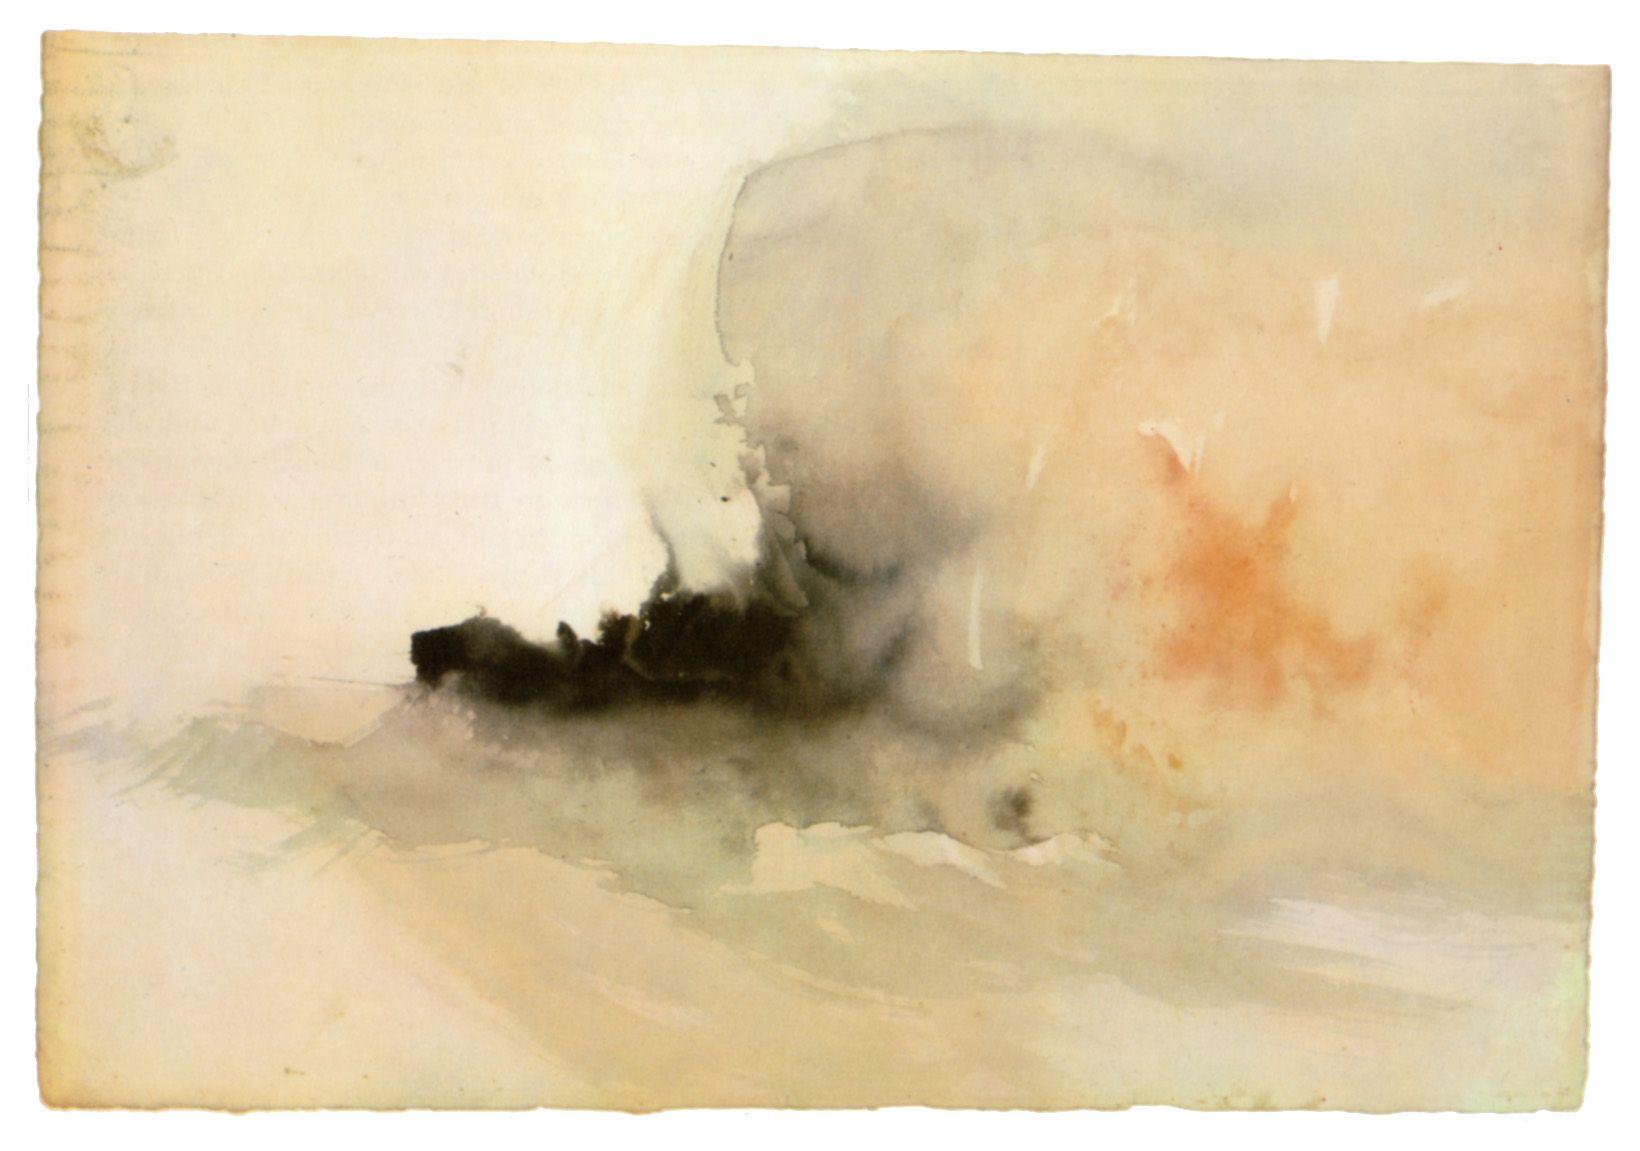 Turner Brennendes Schiff 1830 J M W Turner Wikipedia In